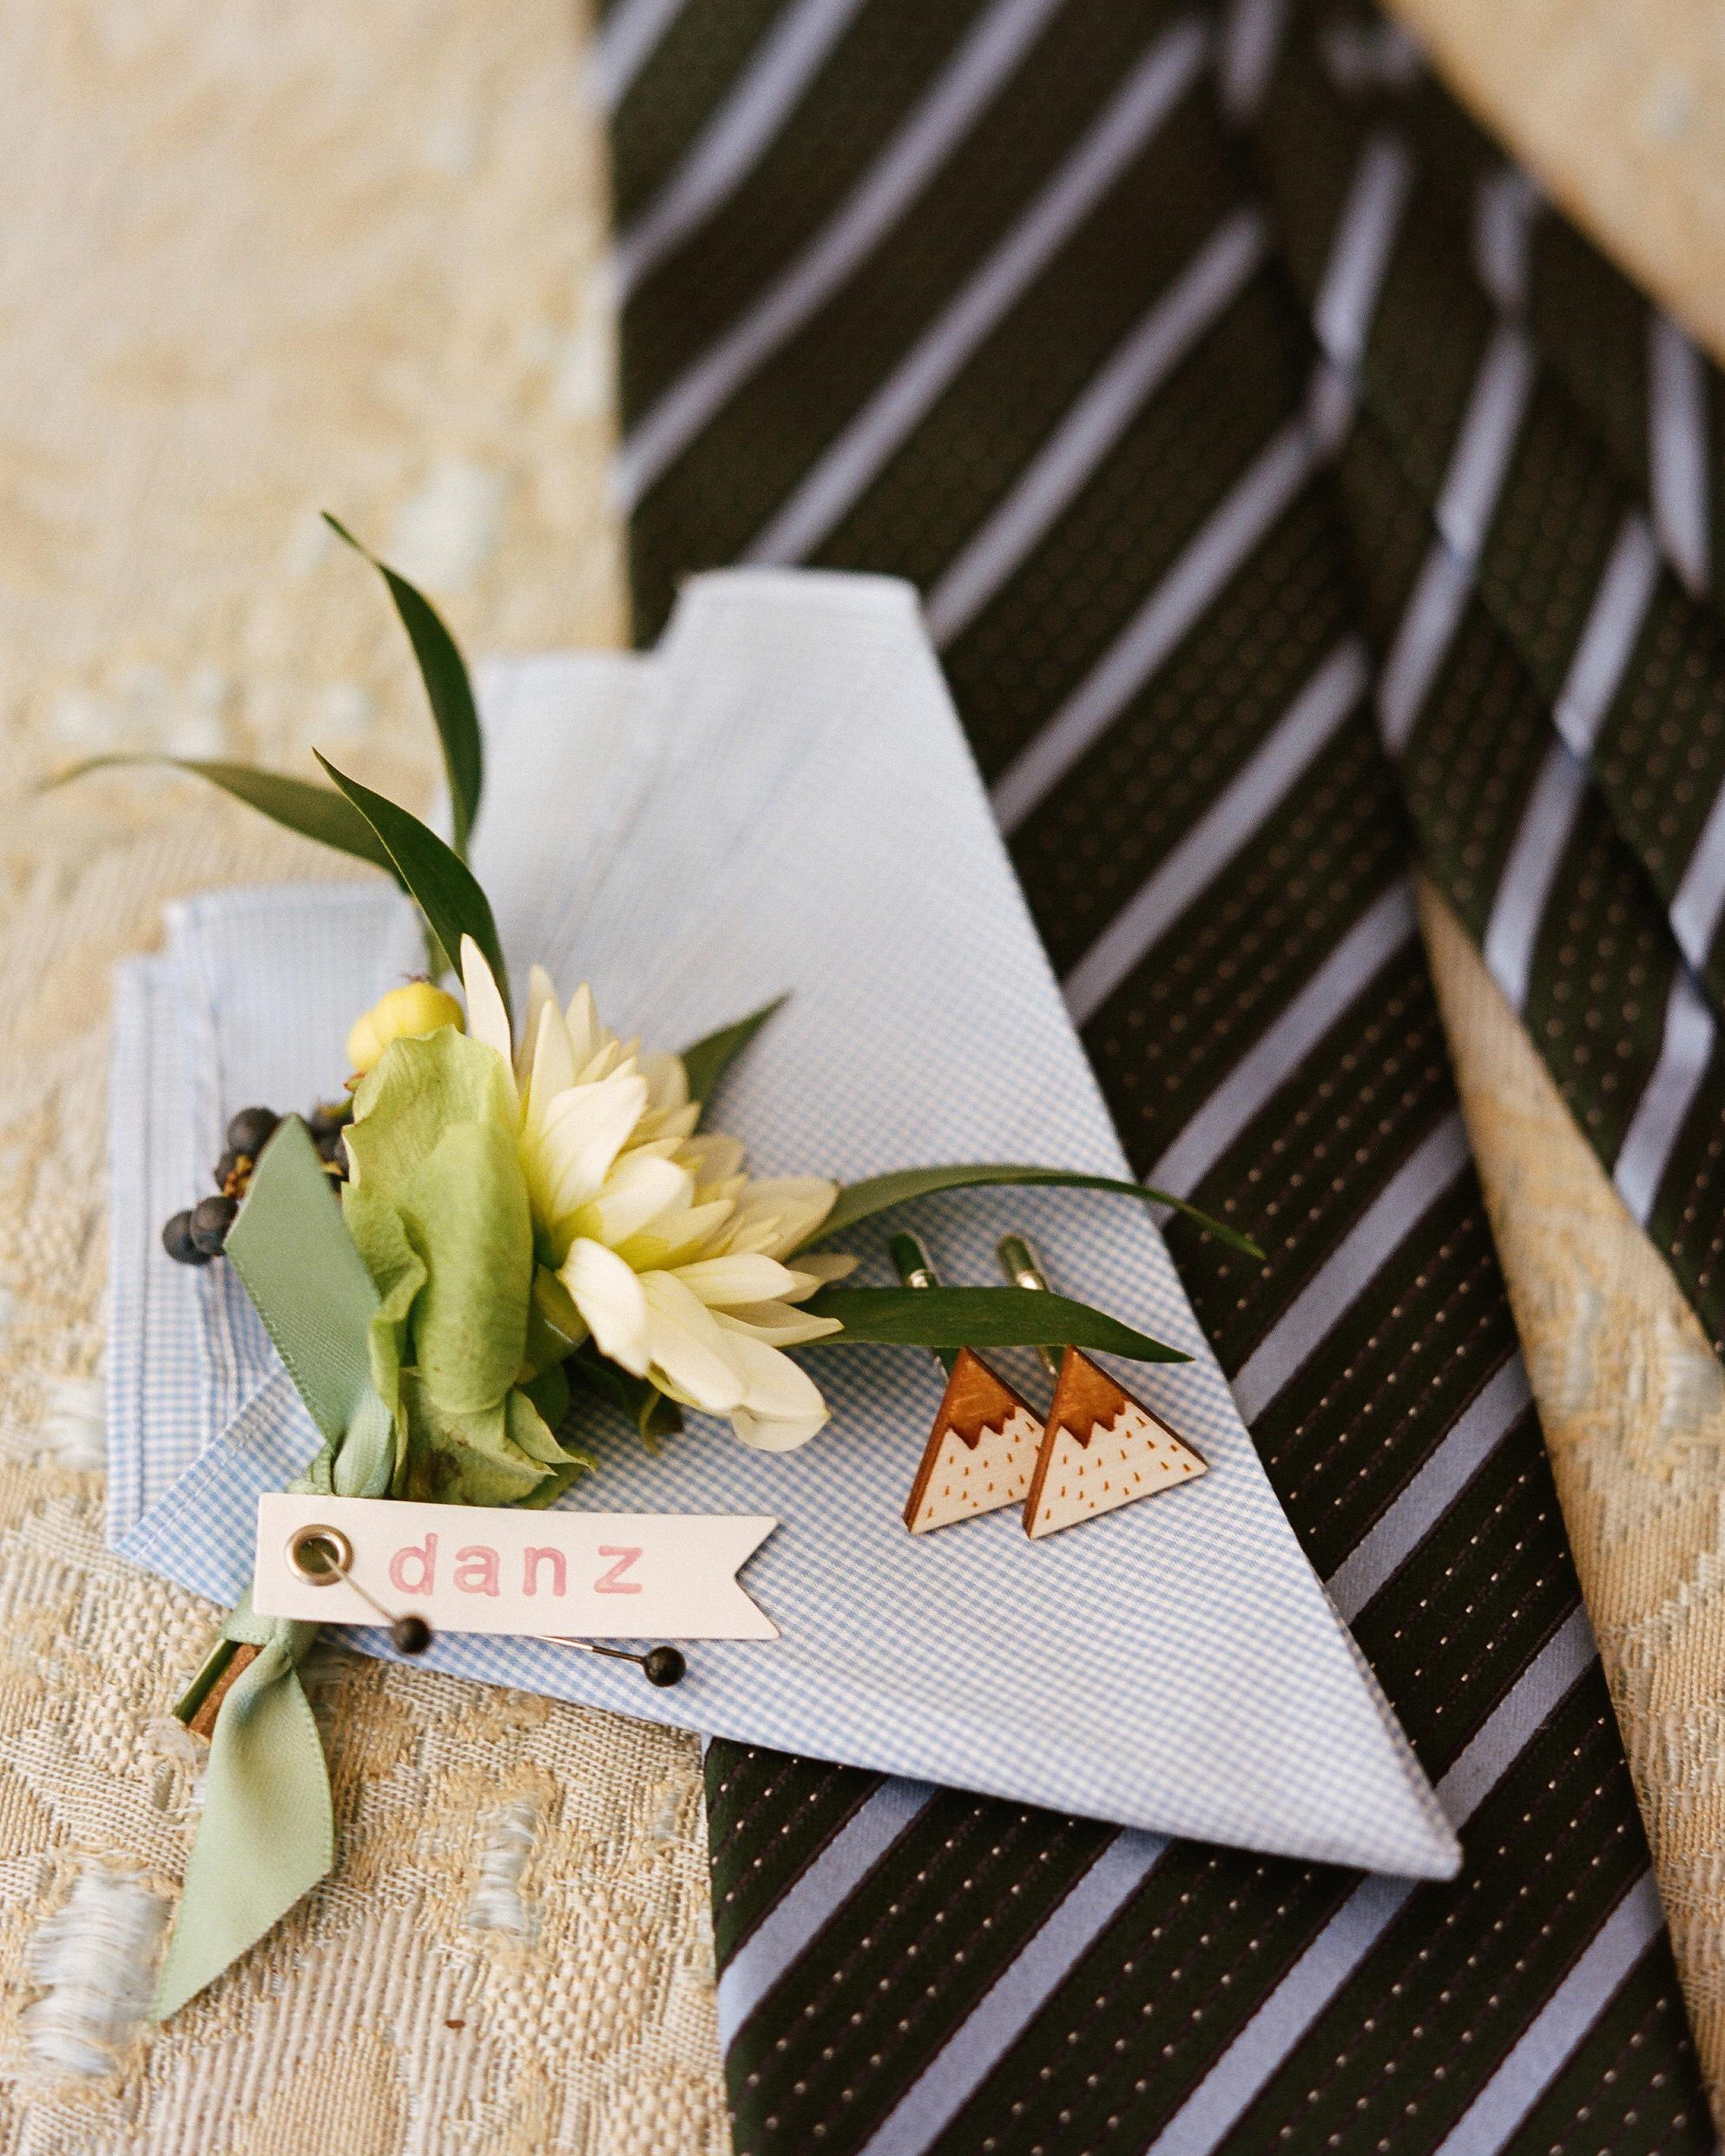 lana-danny-wedding-accessories-084-s111831-0315.jpg